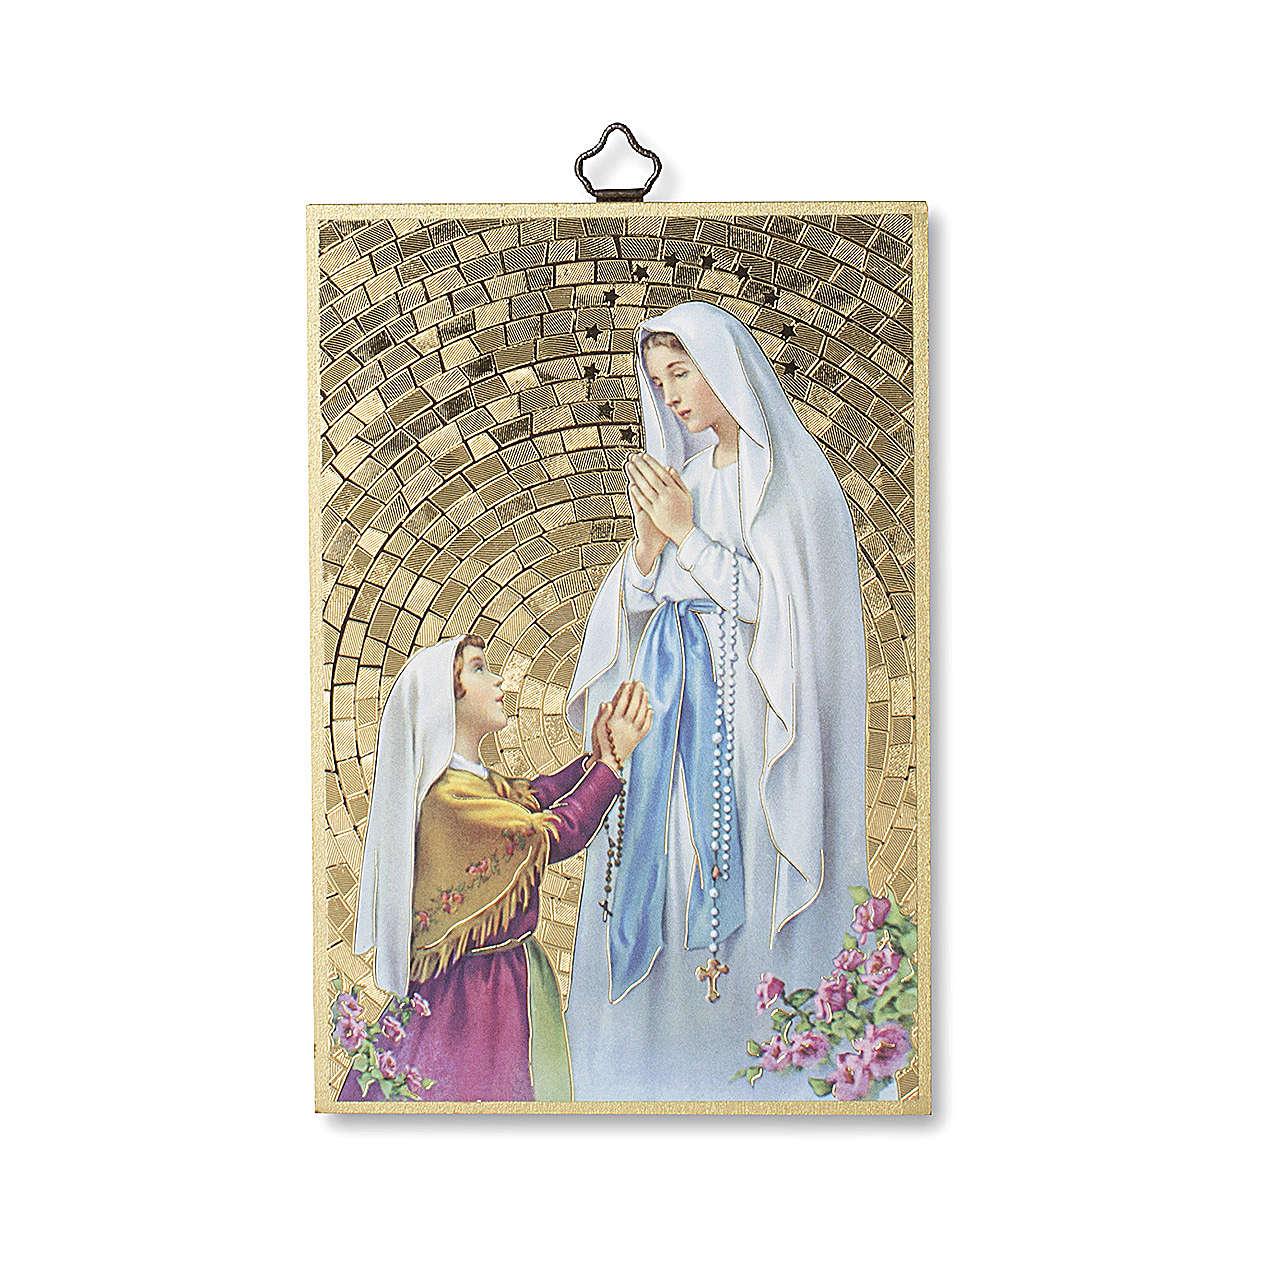 Impreso sobre madera Aparición de Lourdes con Bernadette Novena Lourdes ITA 3